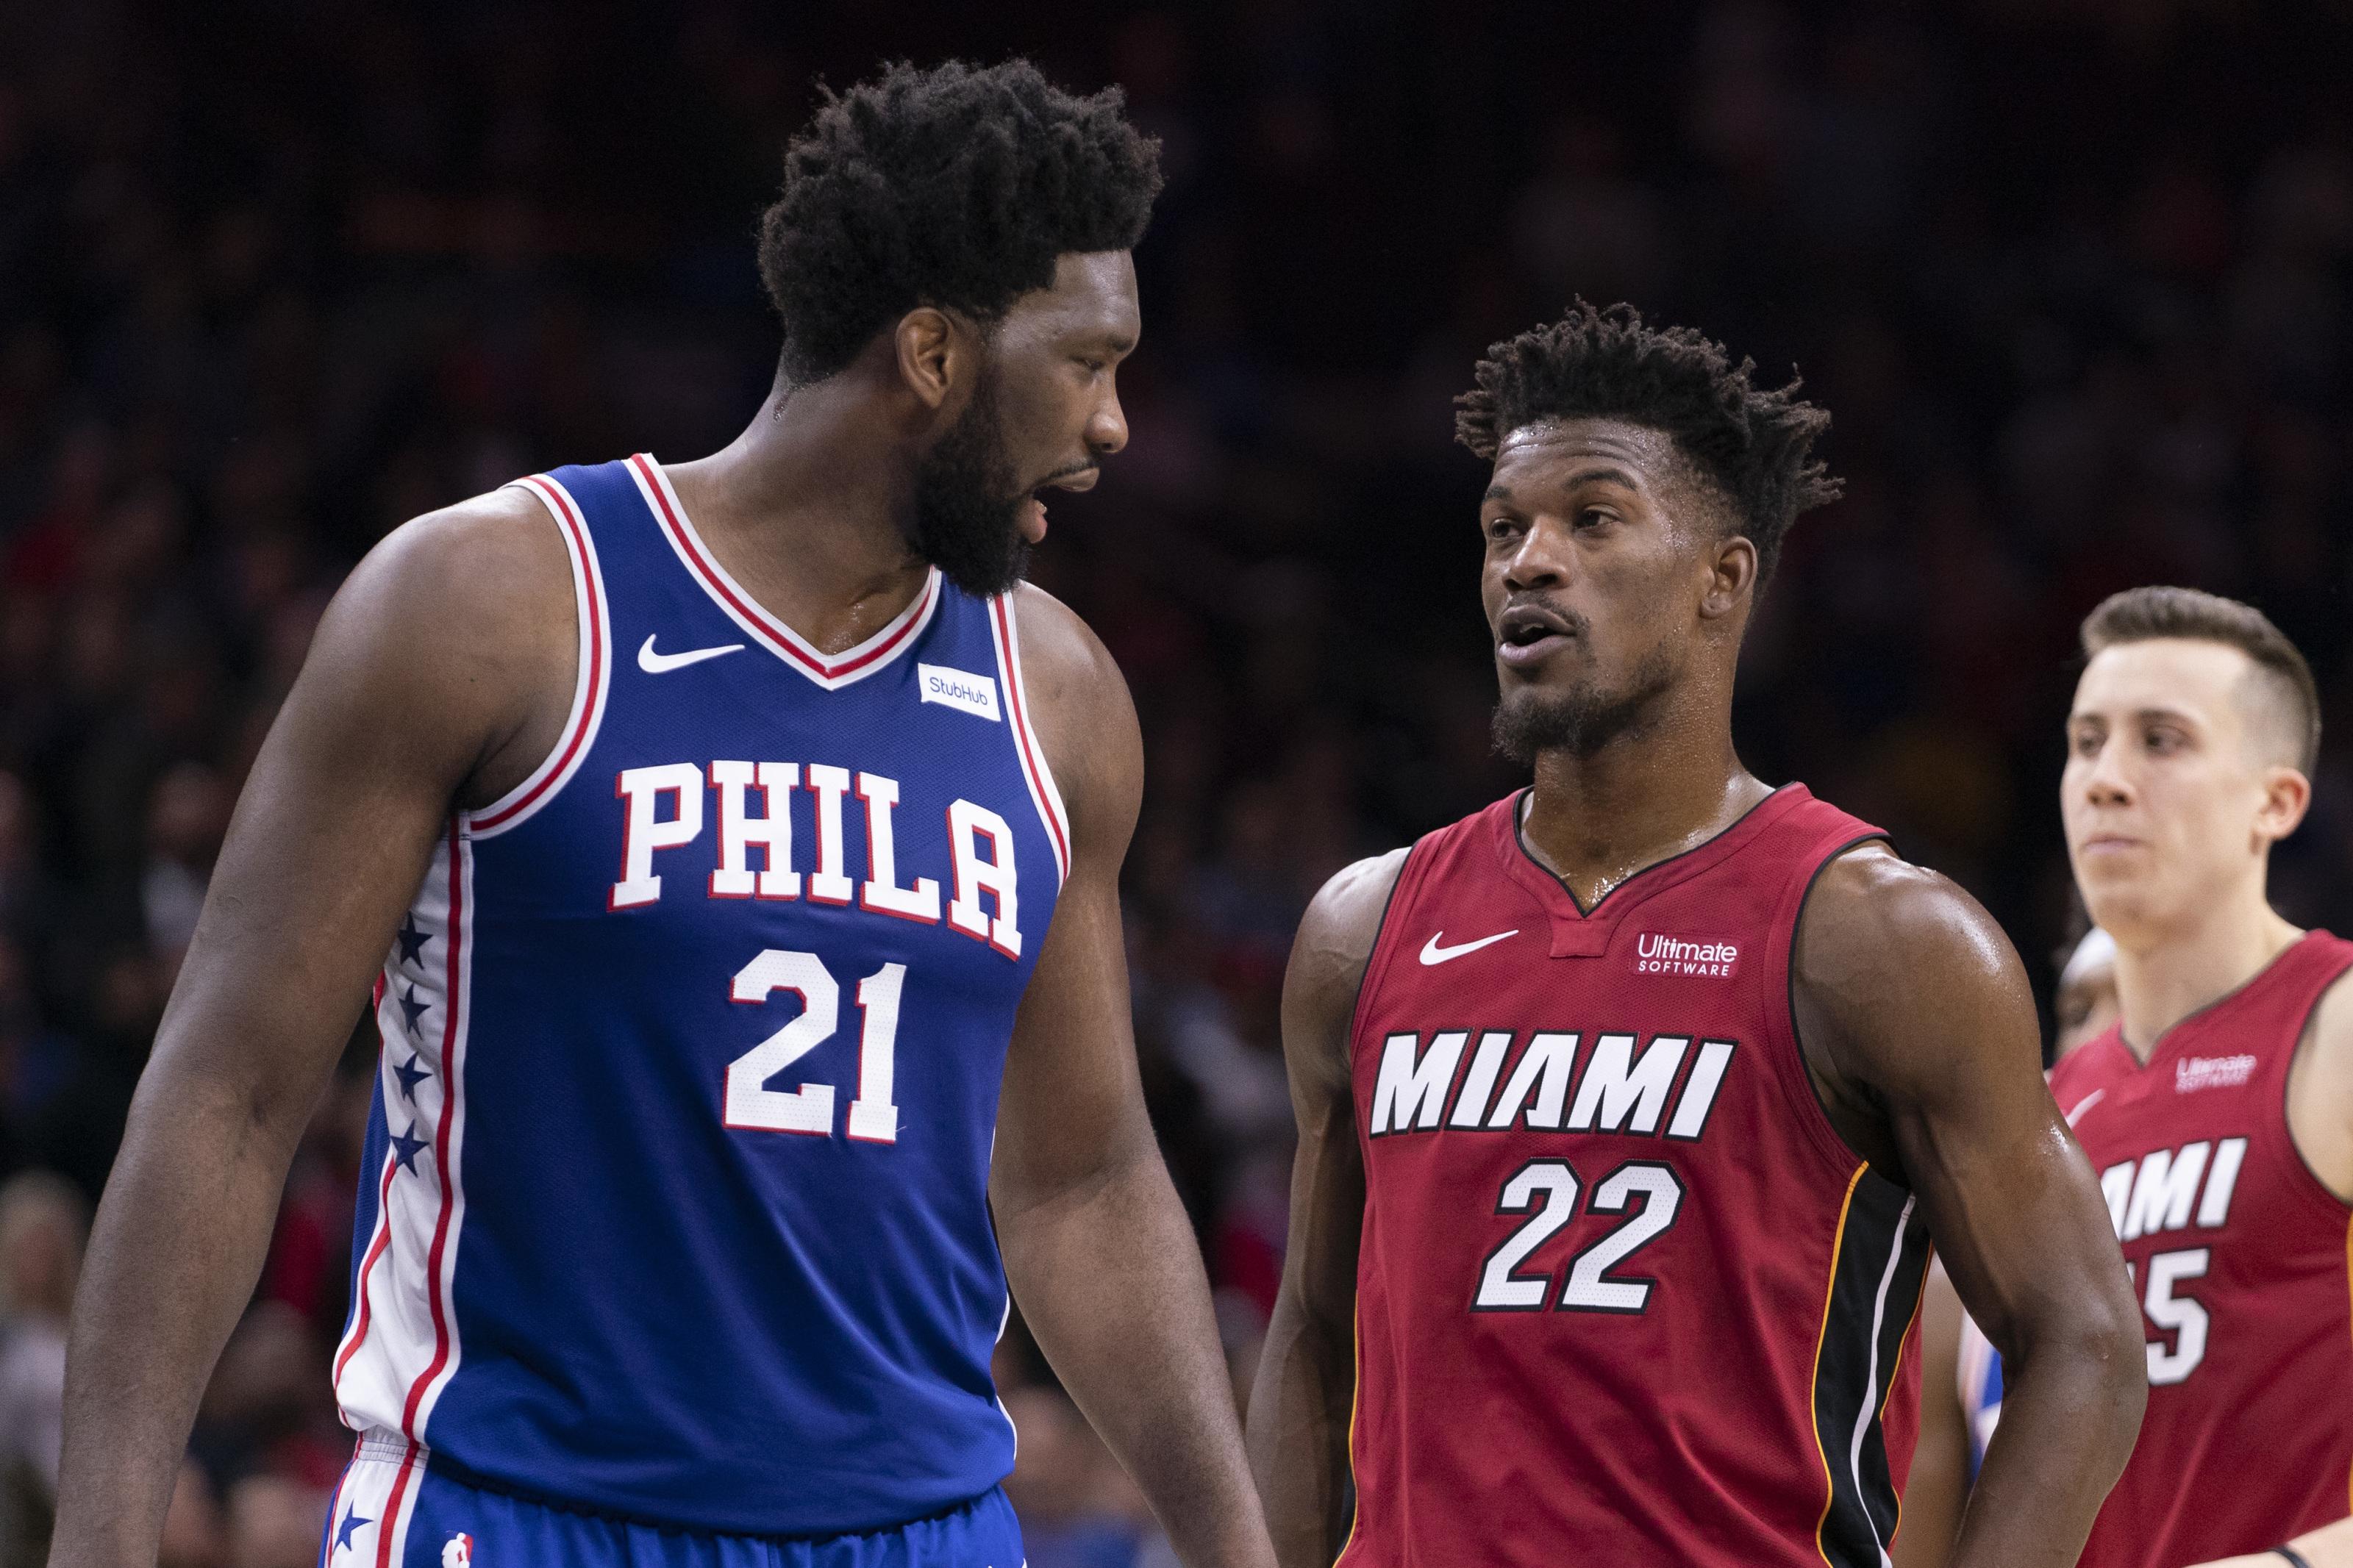 Using NBA 2K20 to predict Philadelphia 76ers vs Miami Heat